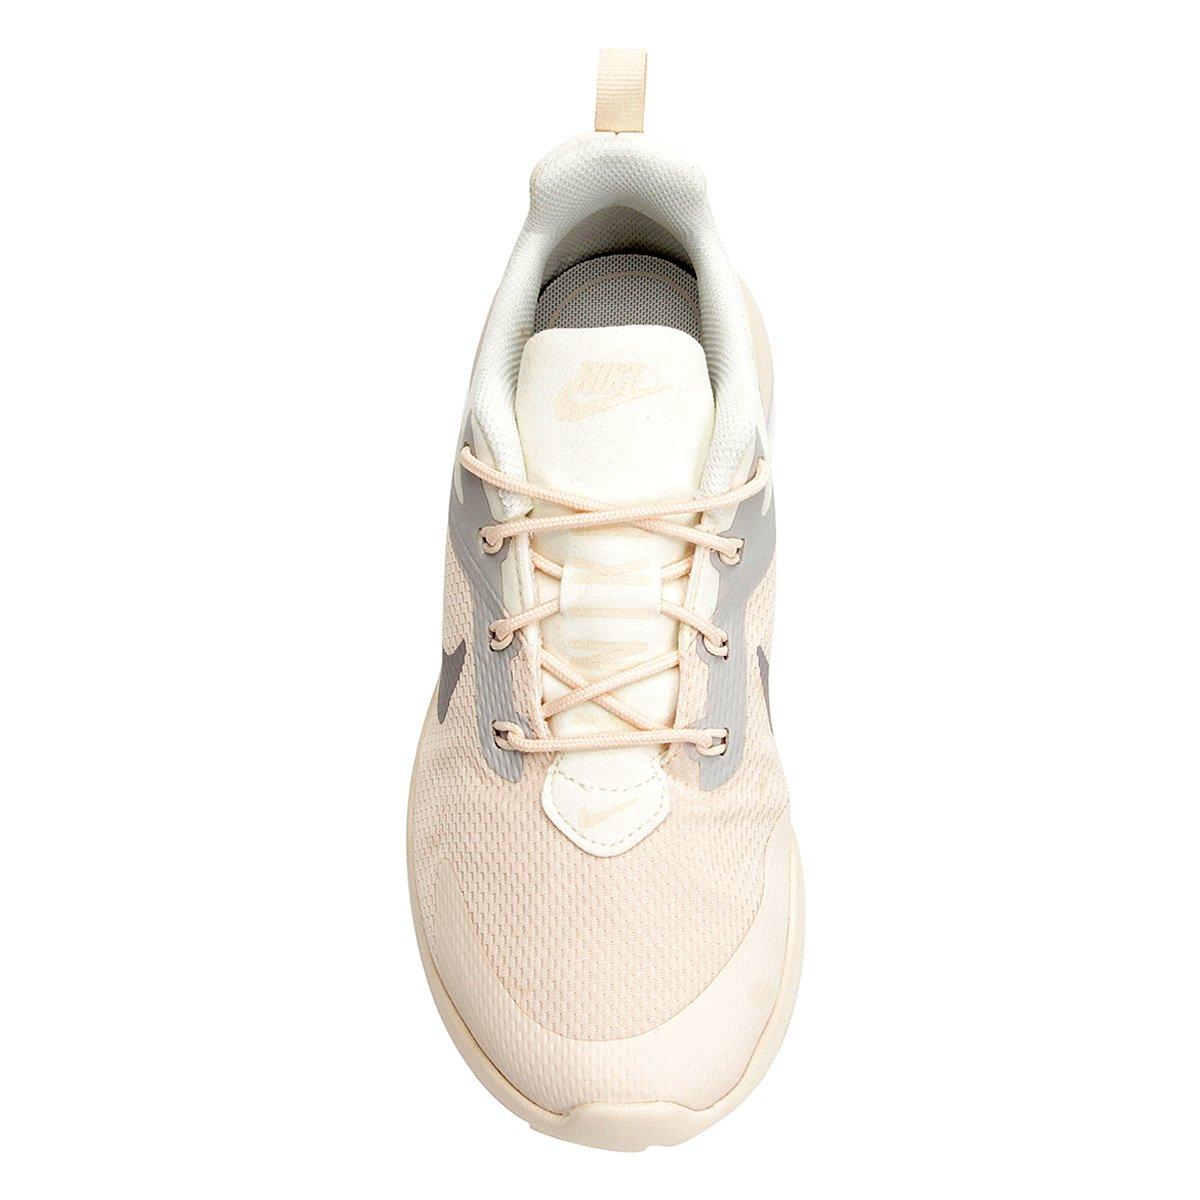 Tênis Nike CK Racer 2 - Bege - Compre Agora   Zattini 479bfa064f